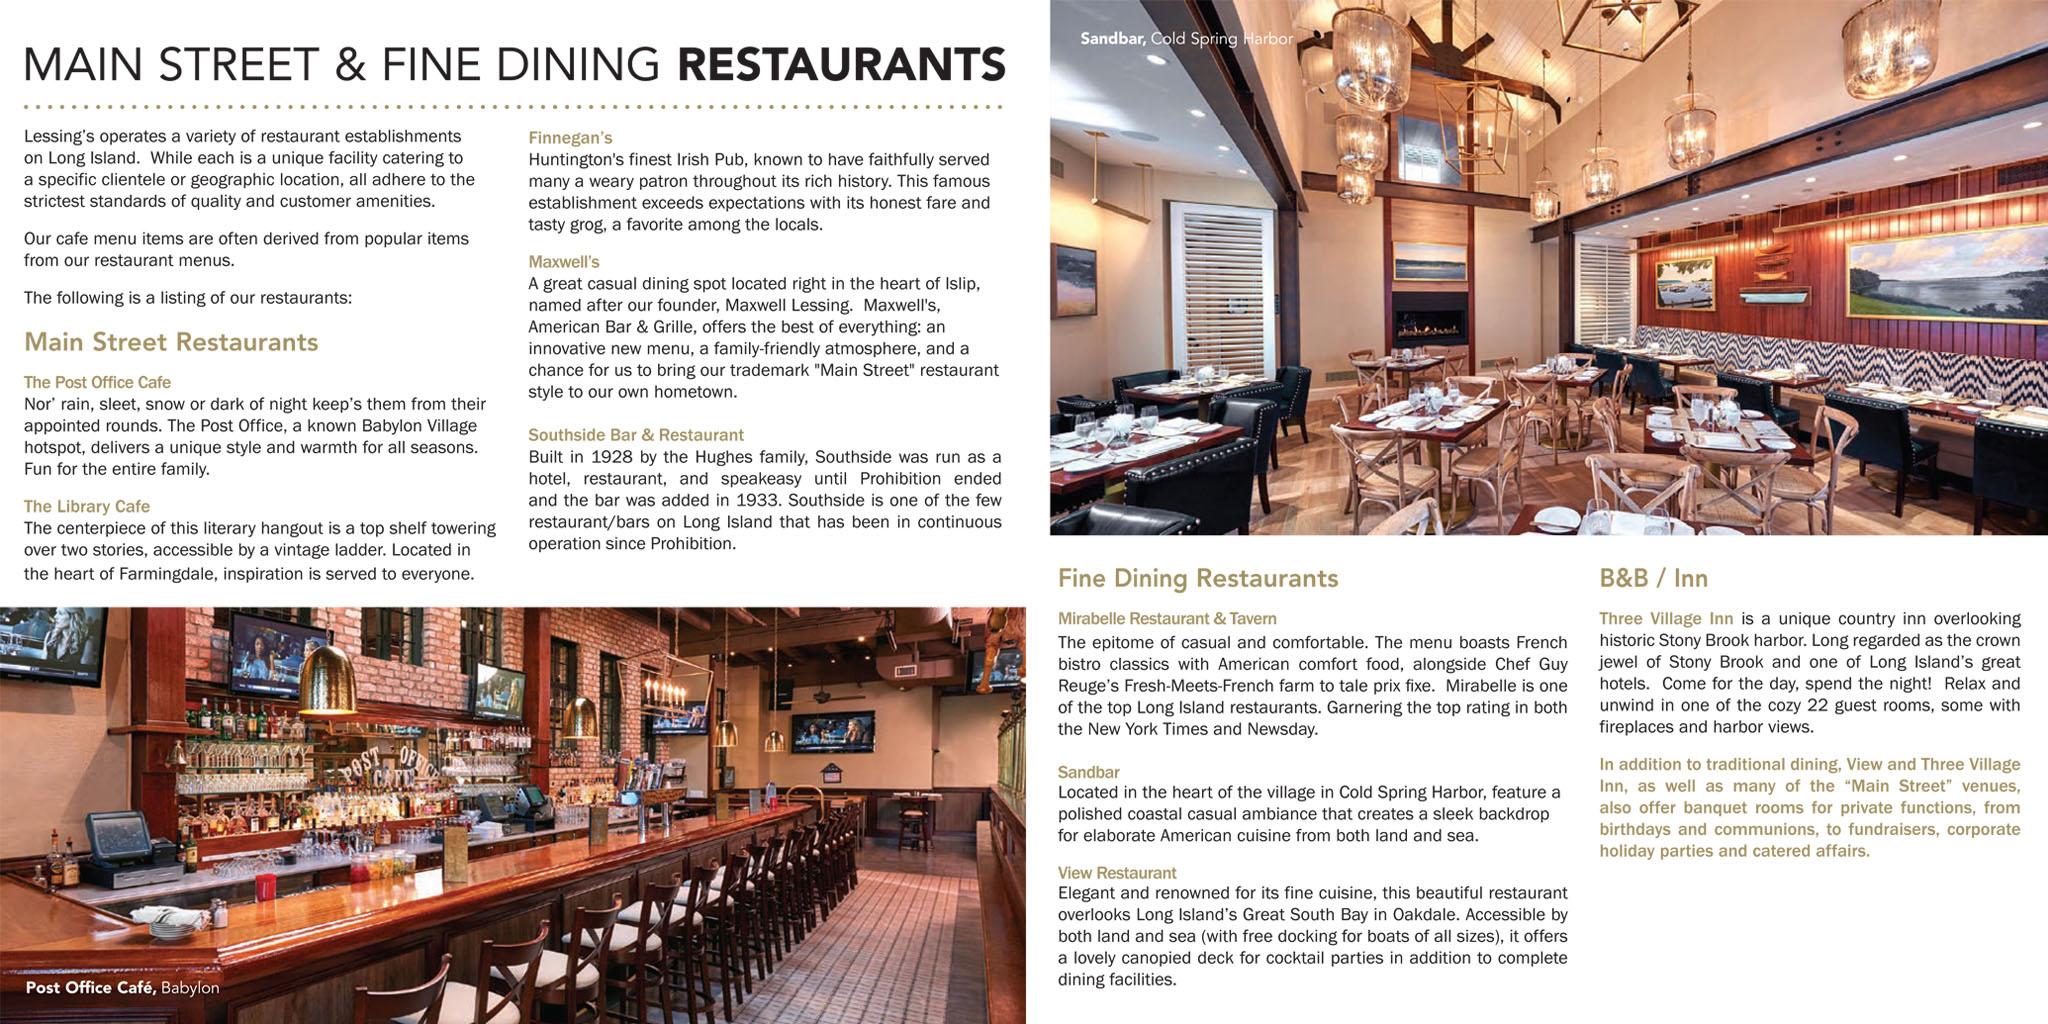 Business Plan Restaurant Vegetarian Personal Essay - Farm to table restaurant business plan